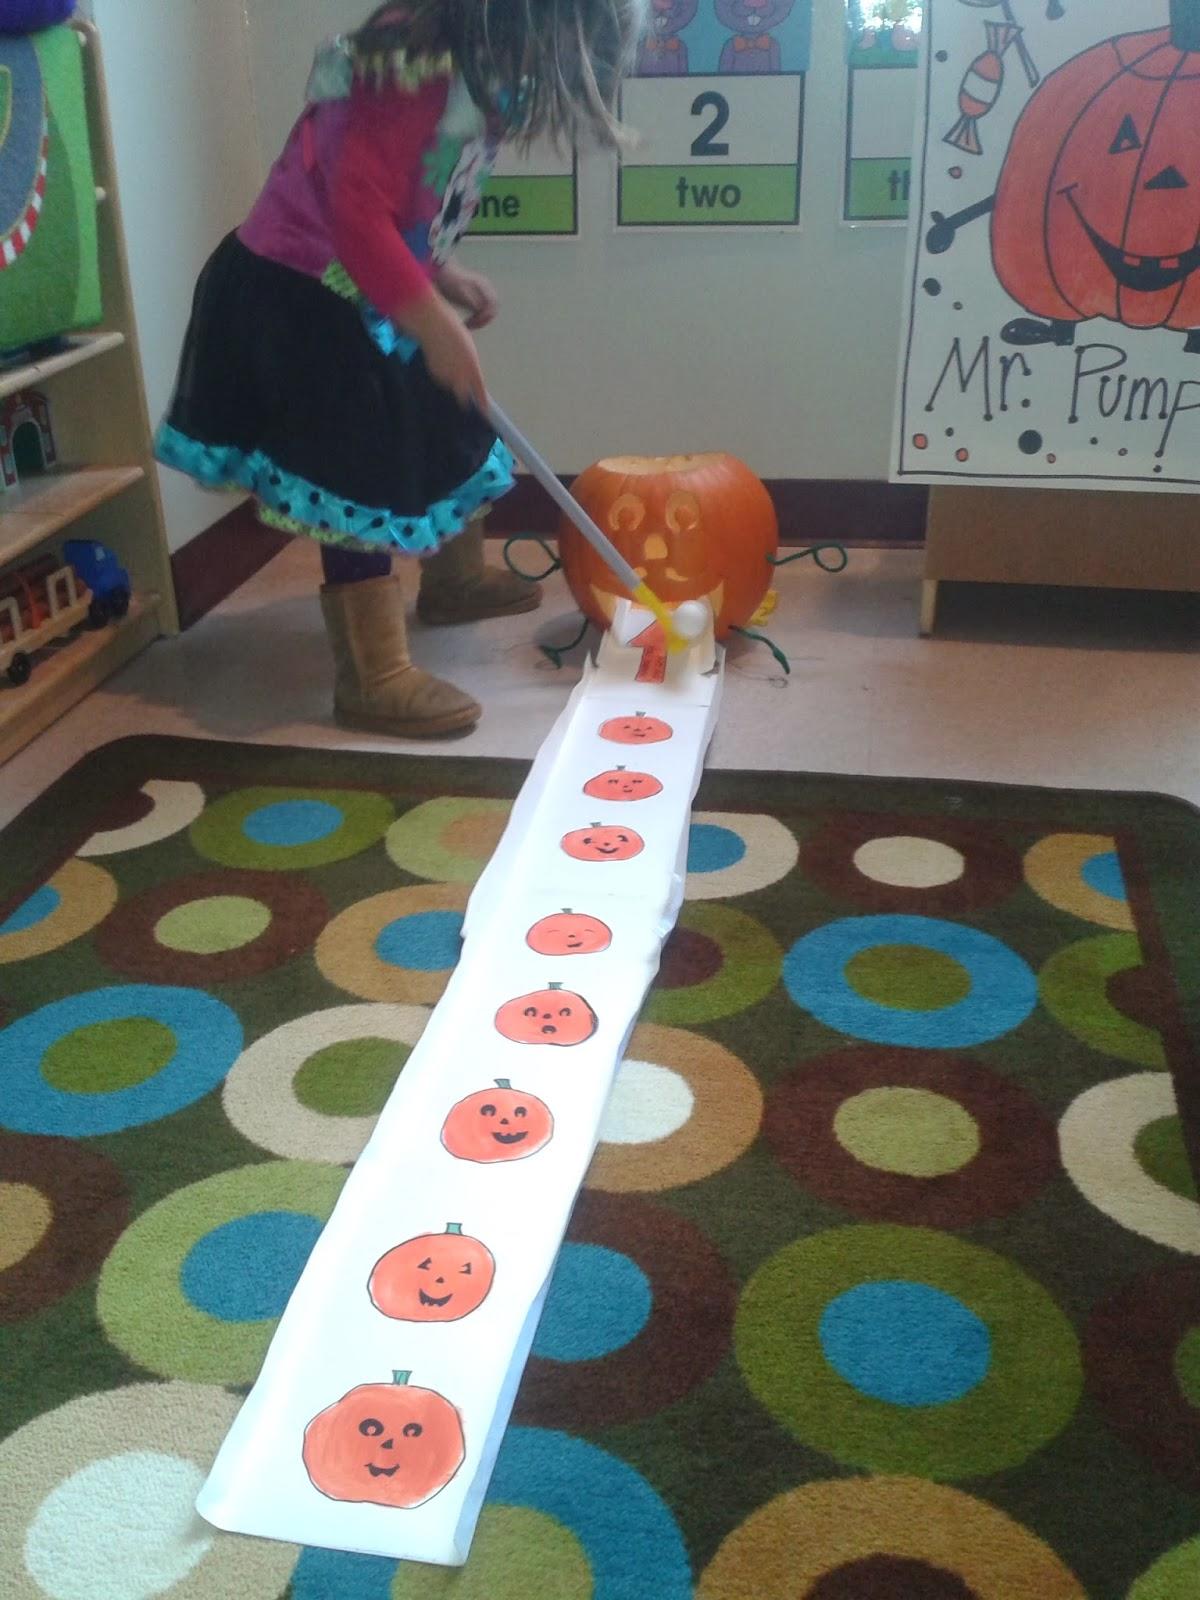 Kinder Garden: Teach Easy Resources: Halloween Party Ideas For Preschool